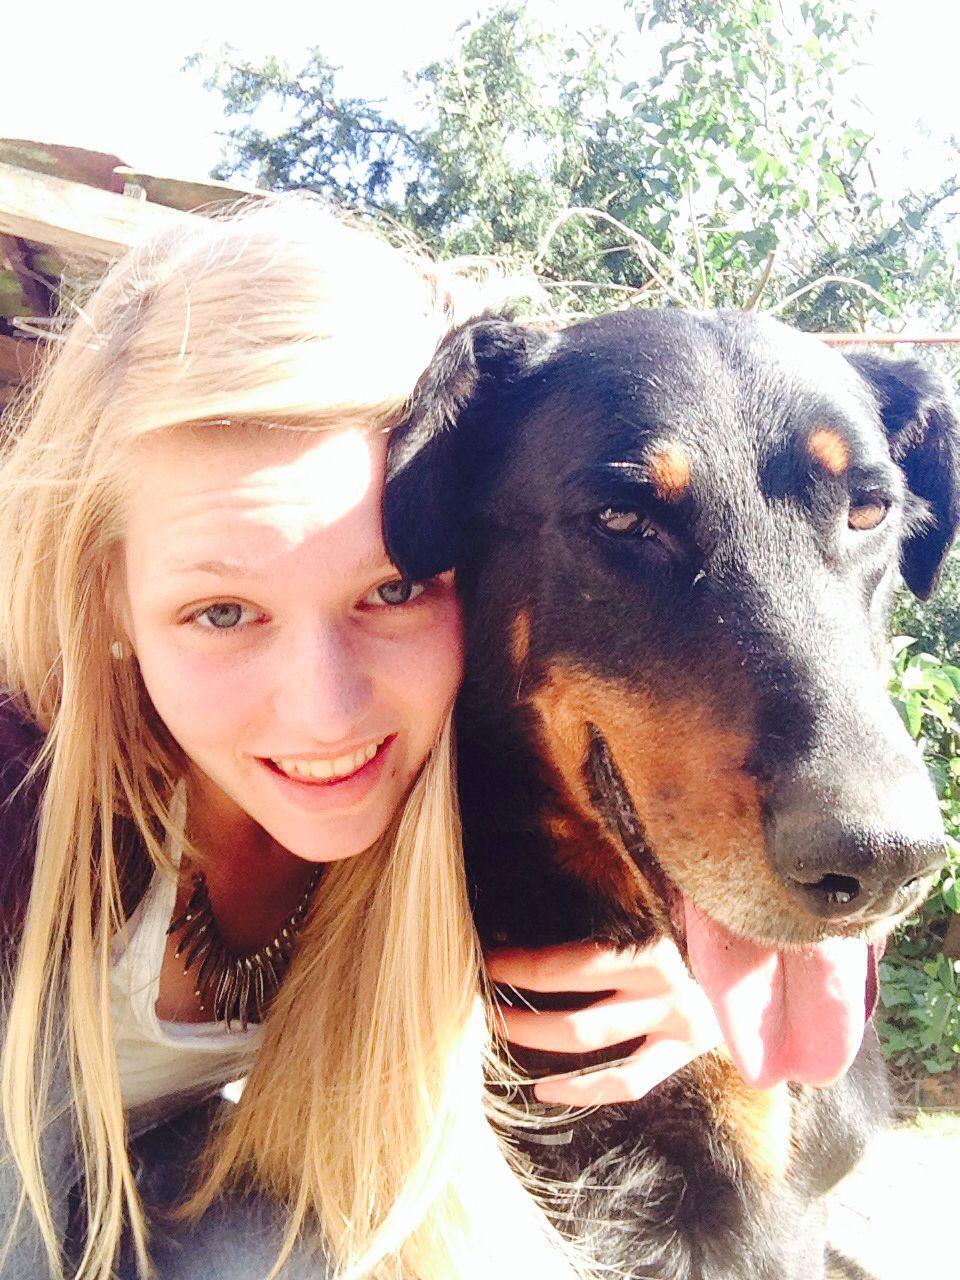 Playin with my dog #sunshine #weekend